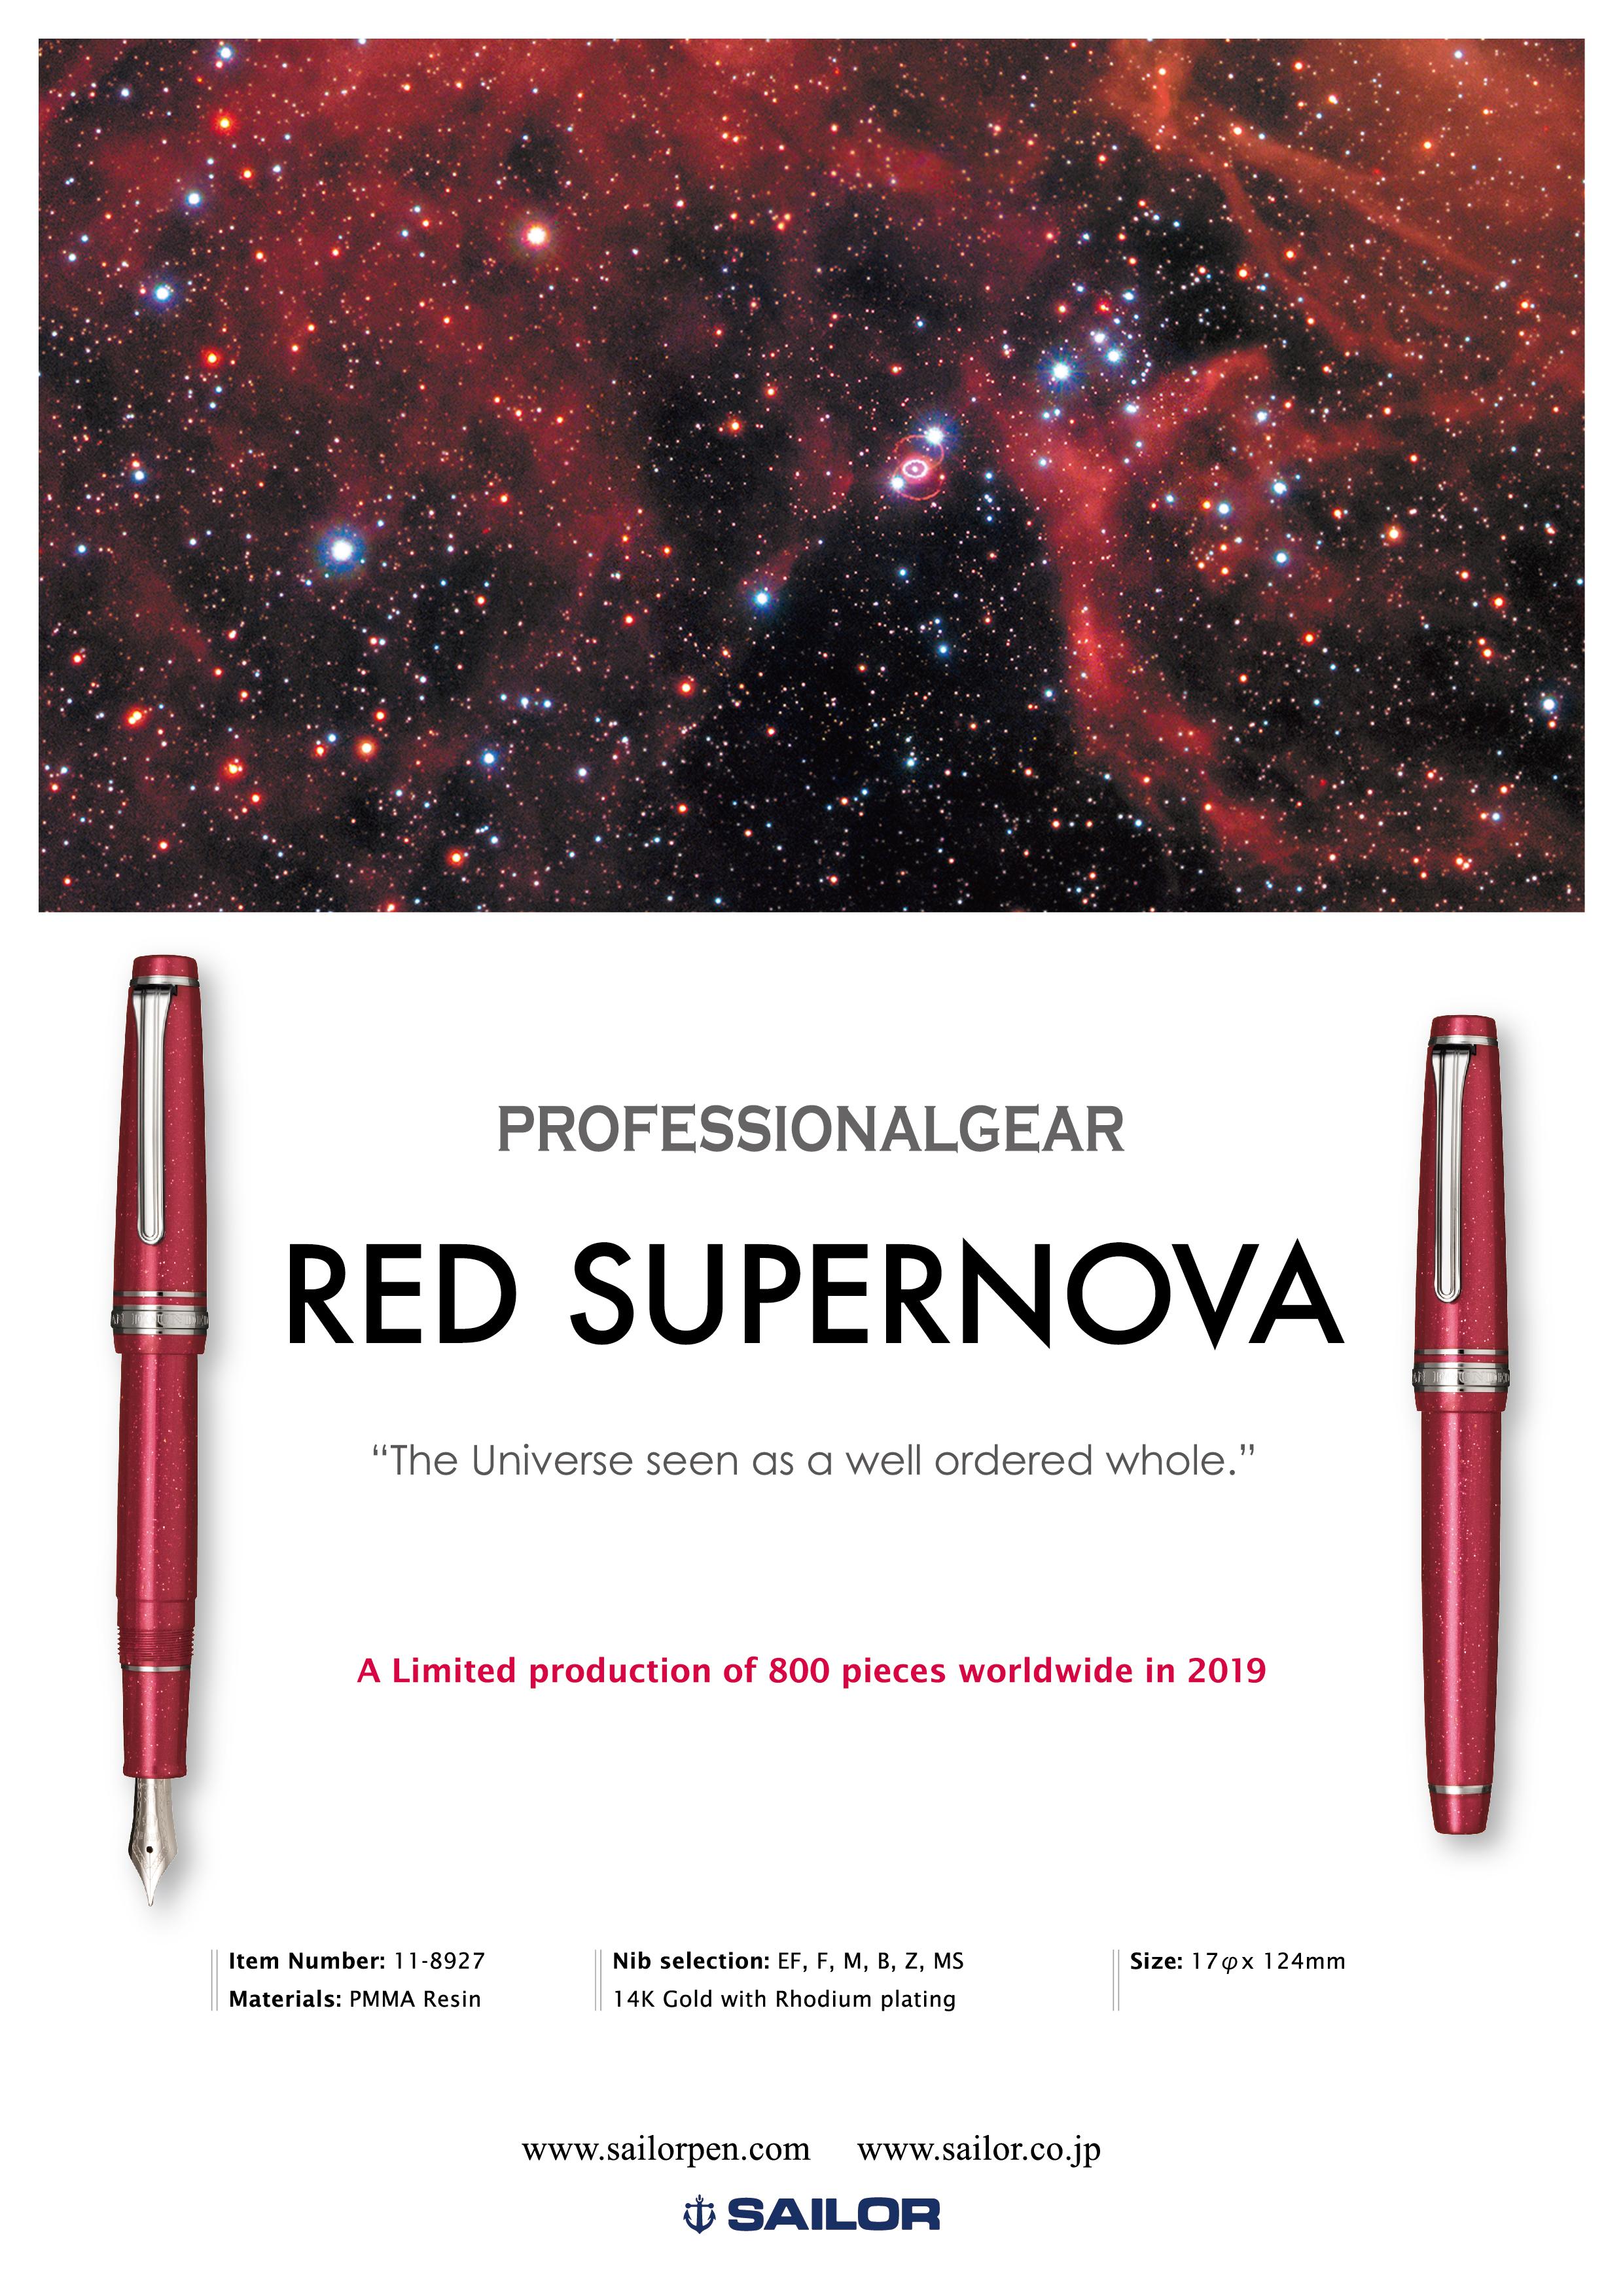 Sailor Professional Gear Slim - Red Supernova